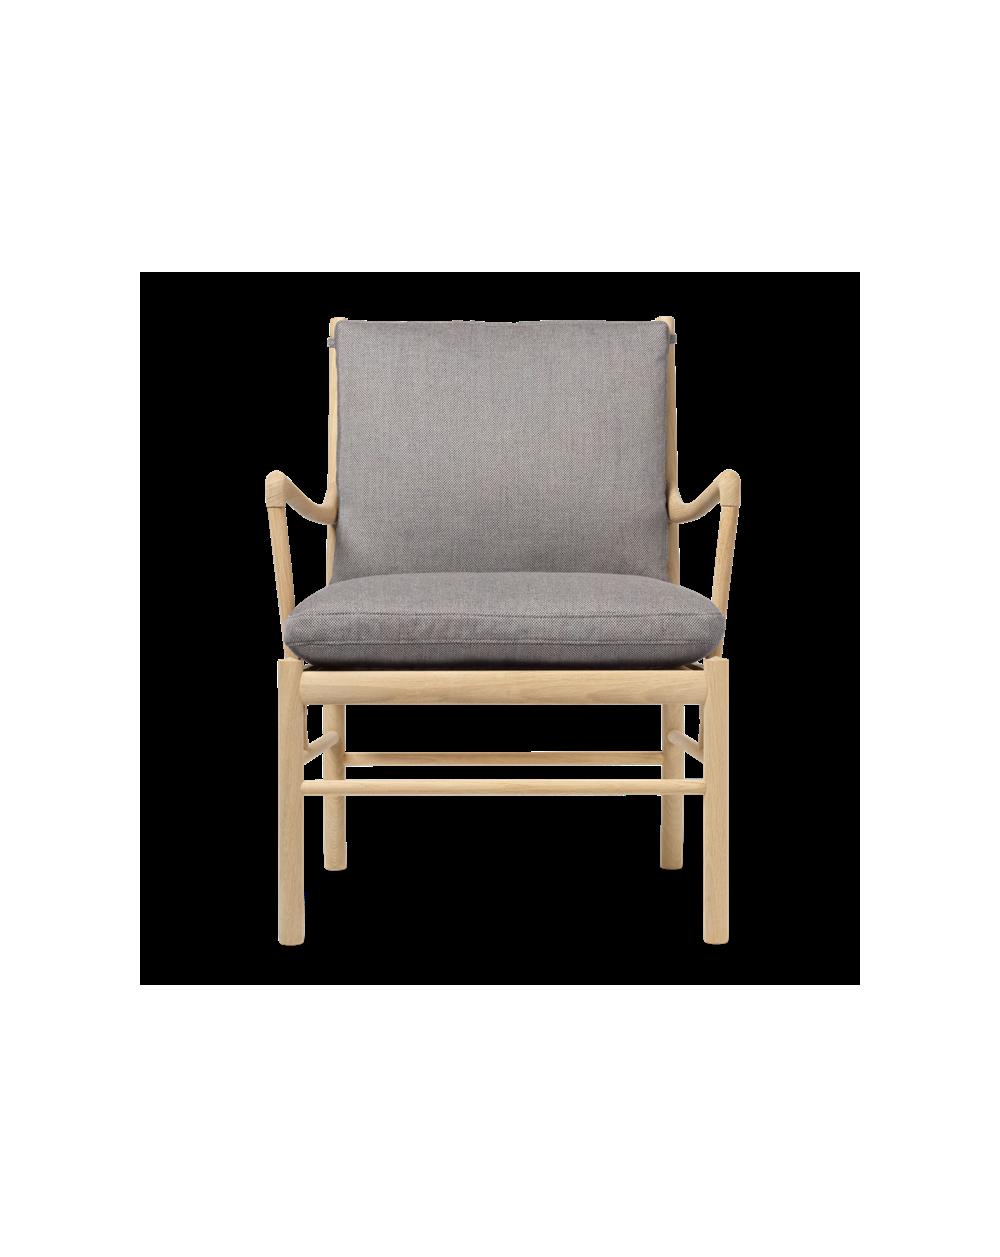 Colonial chair, Ole Wanscher pour Carl Hansen